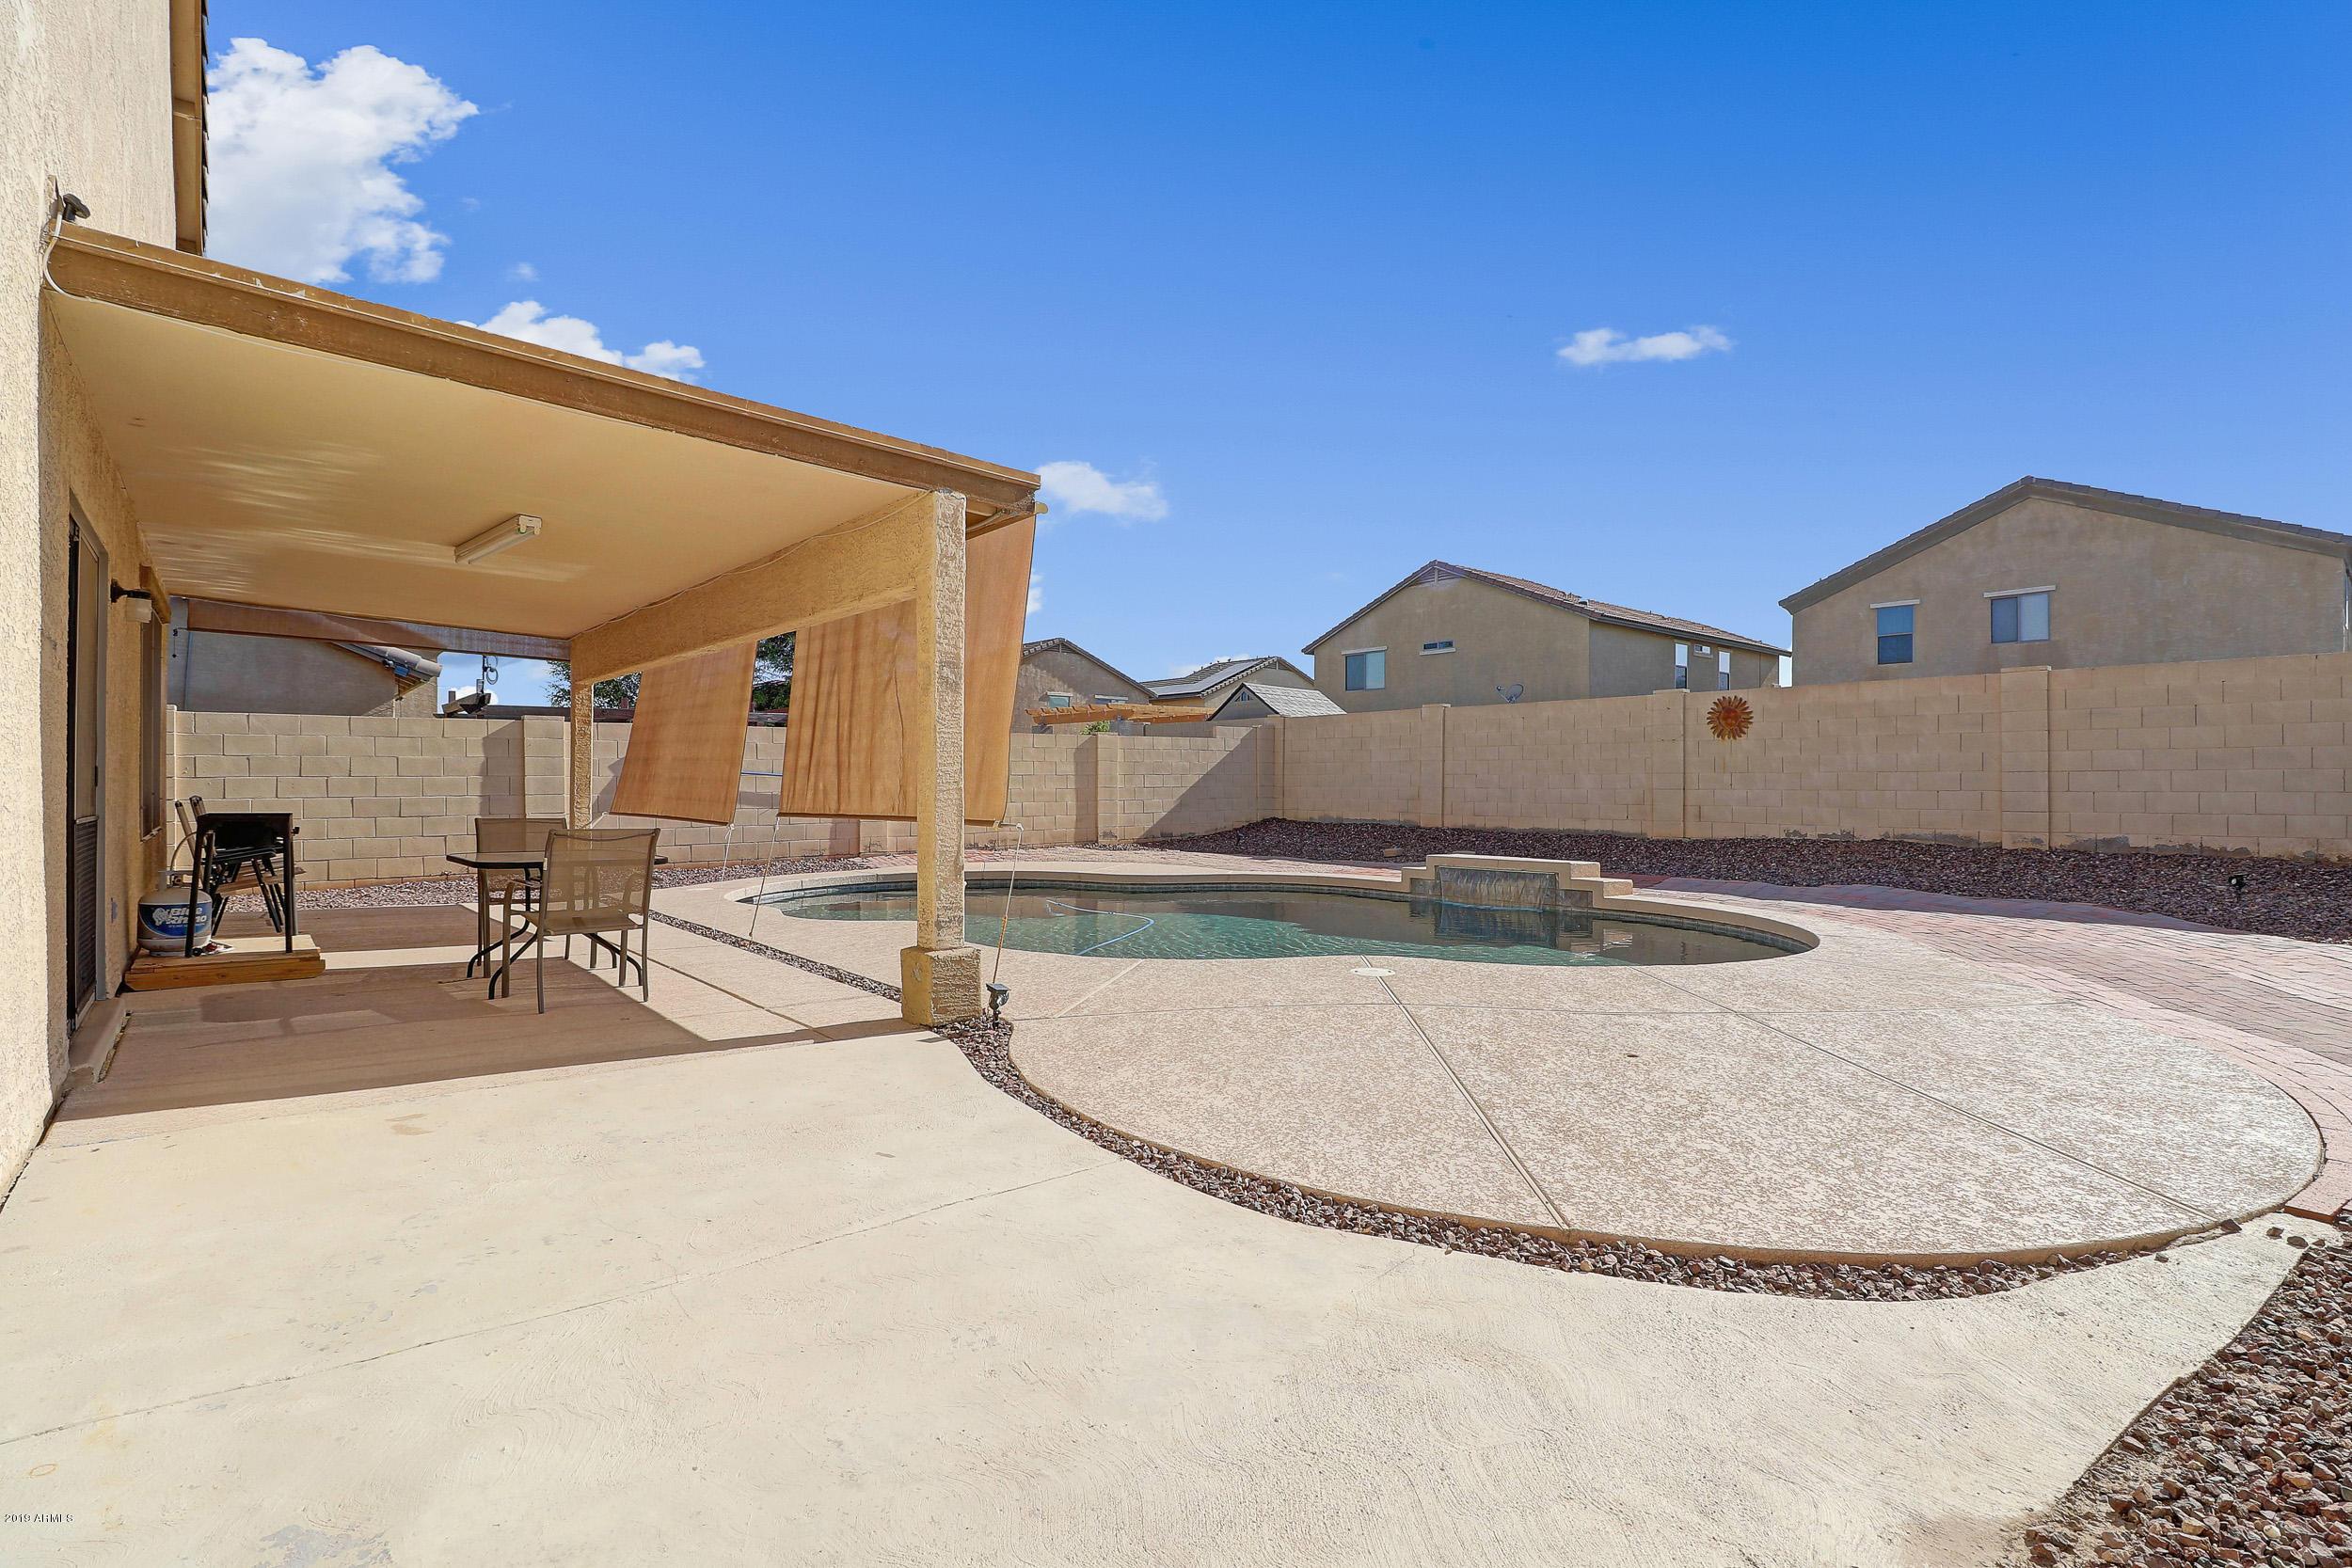 MLS 5951537 4168 S 249TH Drive, Buckeye, AZ 85326 Buckeye AZ Rancho Vista